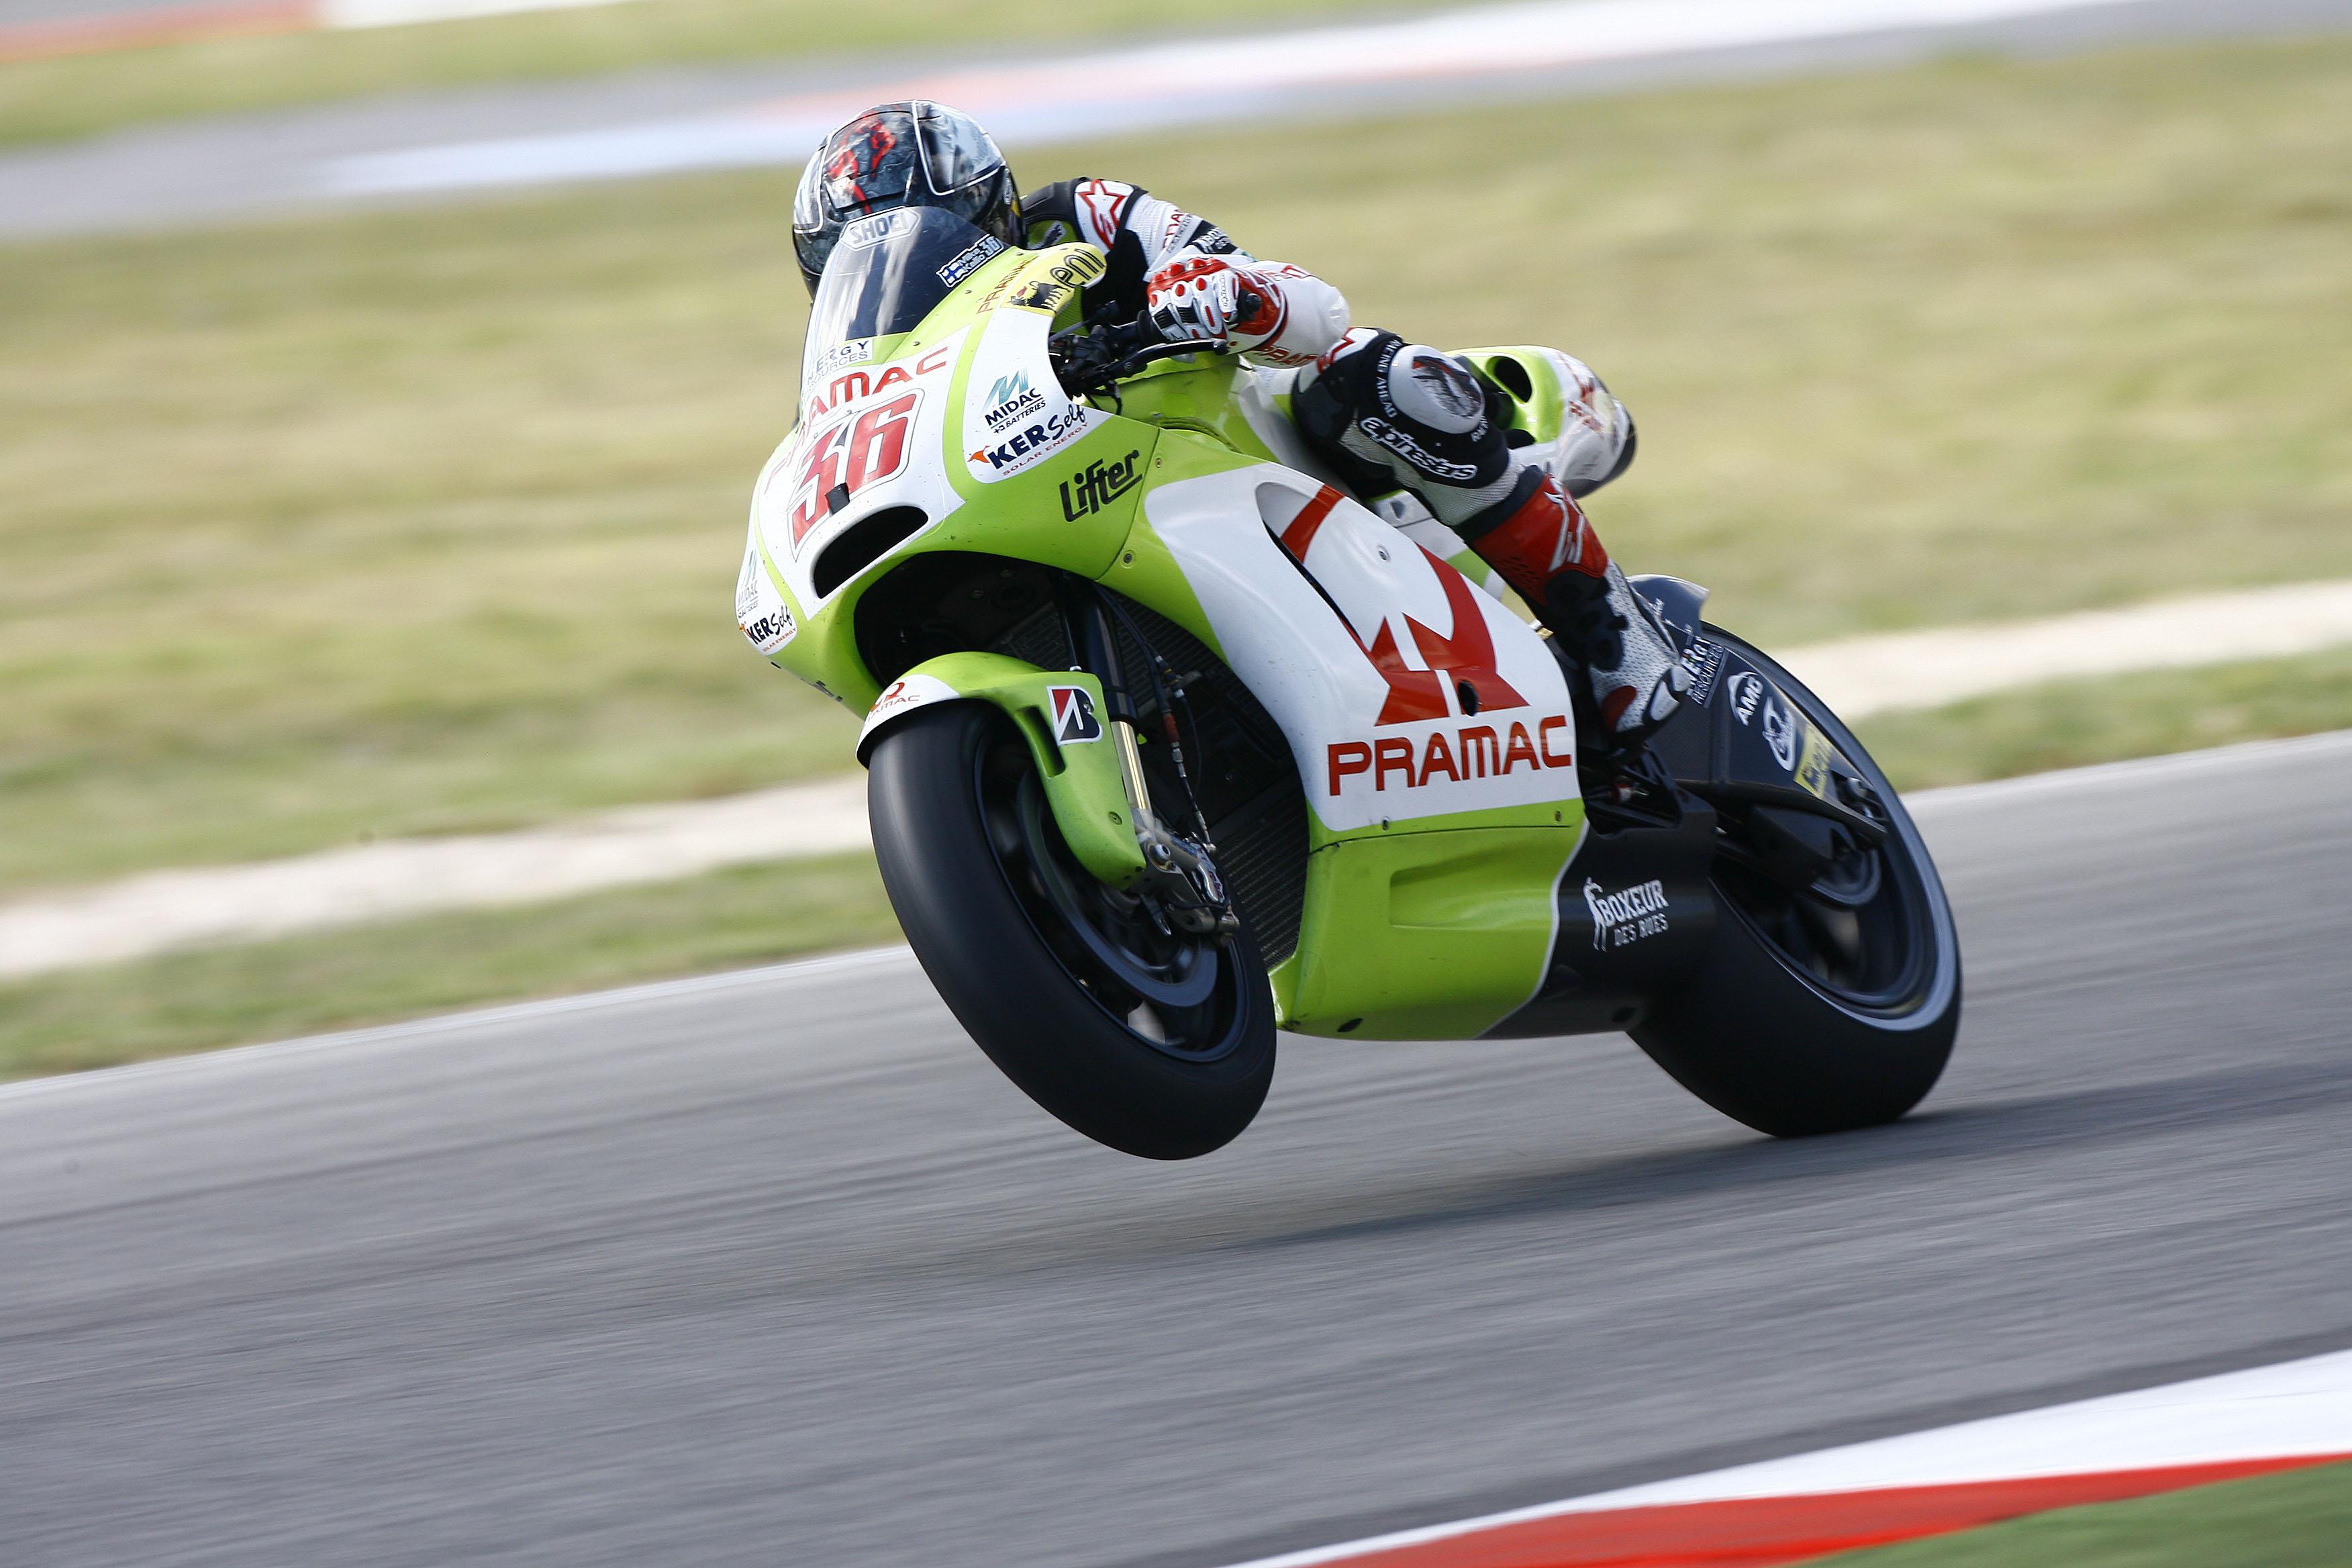 Mika Kallio, Pramac Ducati, MotoGP